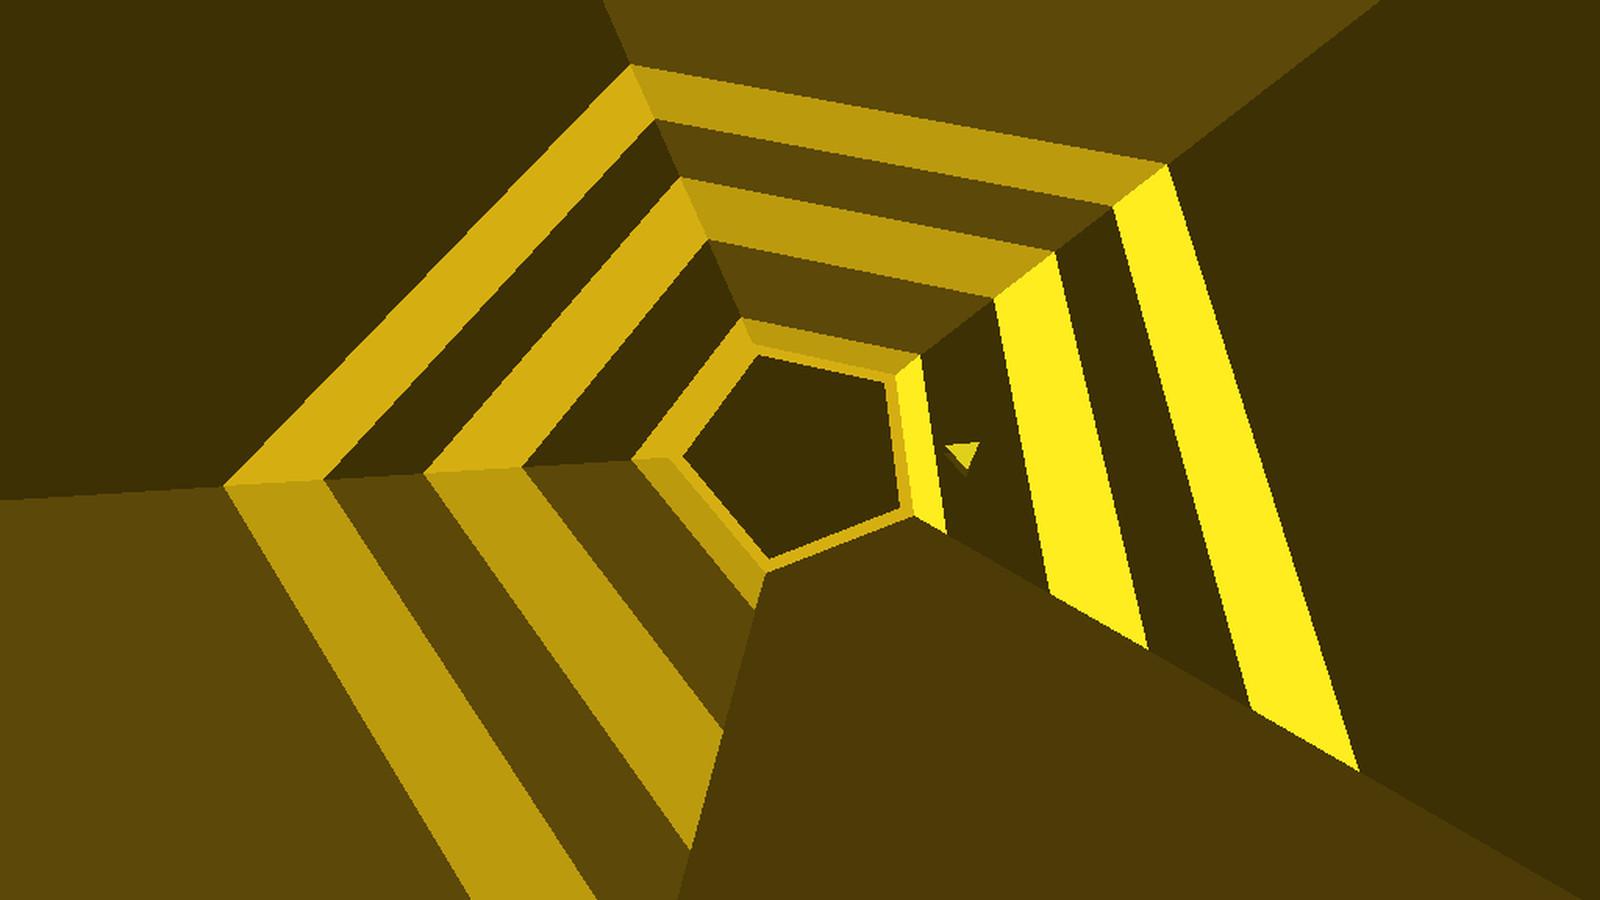 super hexagon - HD1200×800